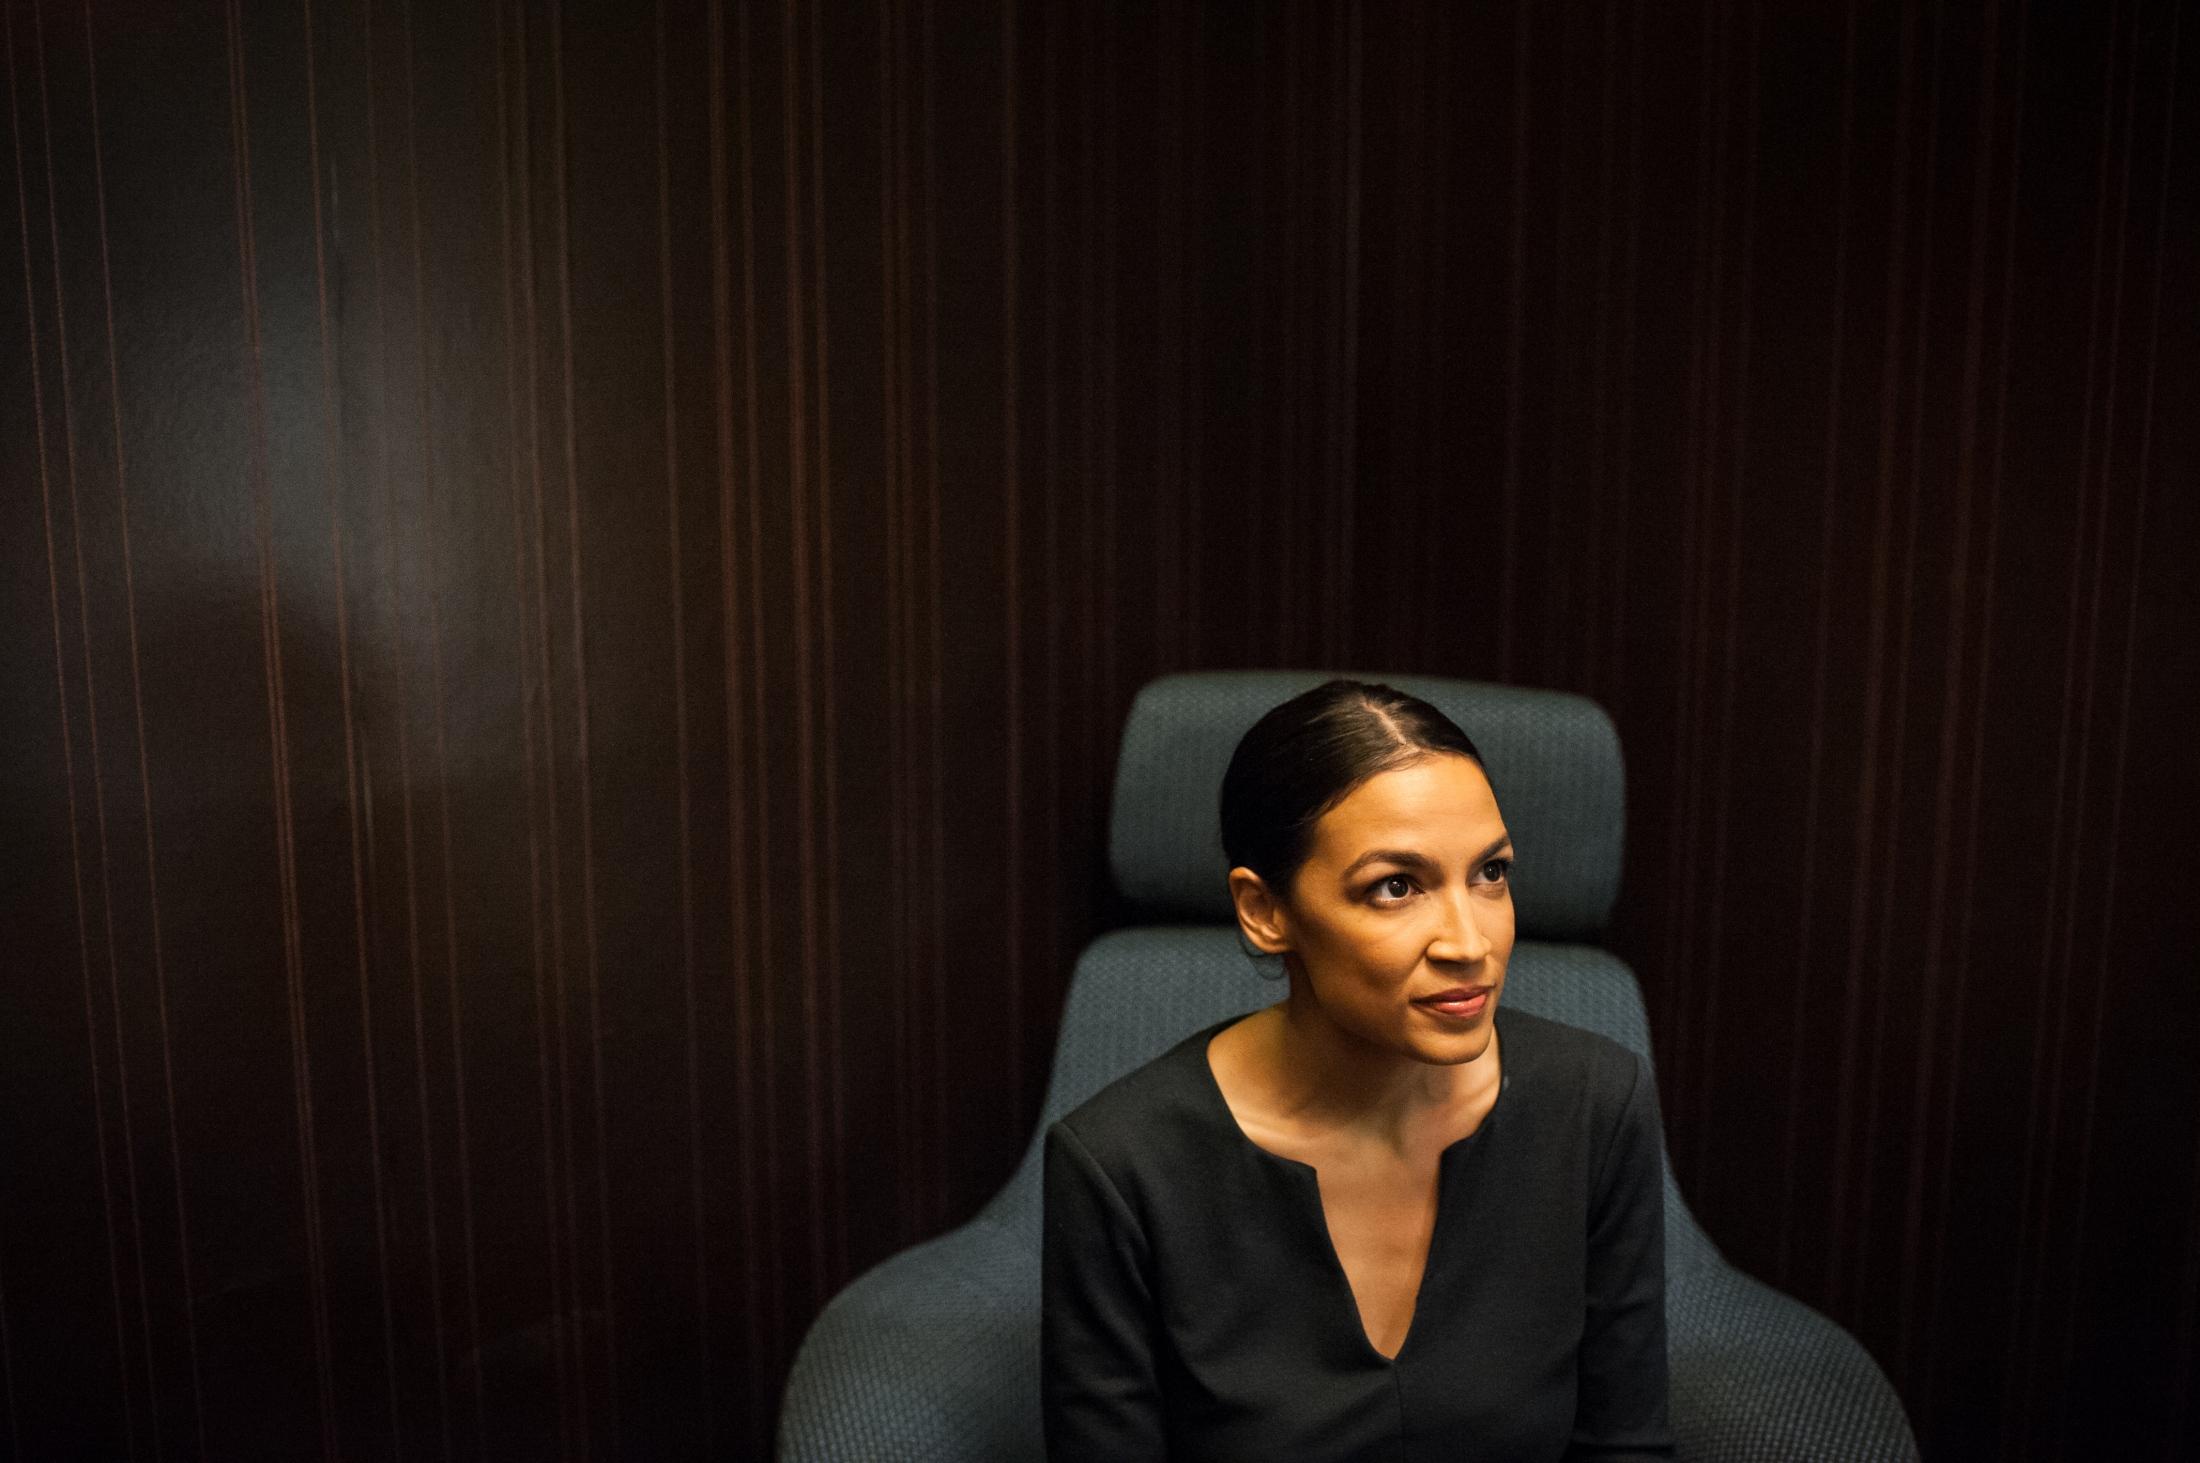 Democratic Socialist congressional candidate (NY-14) Alexandria Ocasio-Cortez. Photographed for CNN.